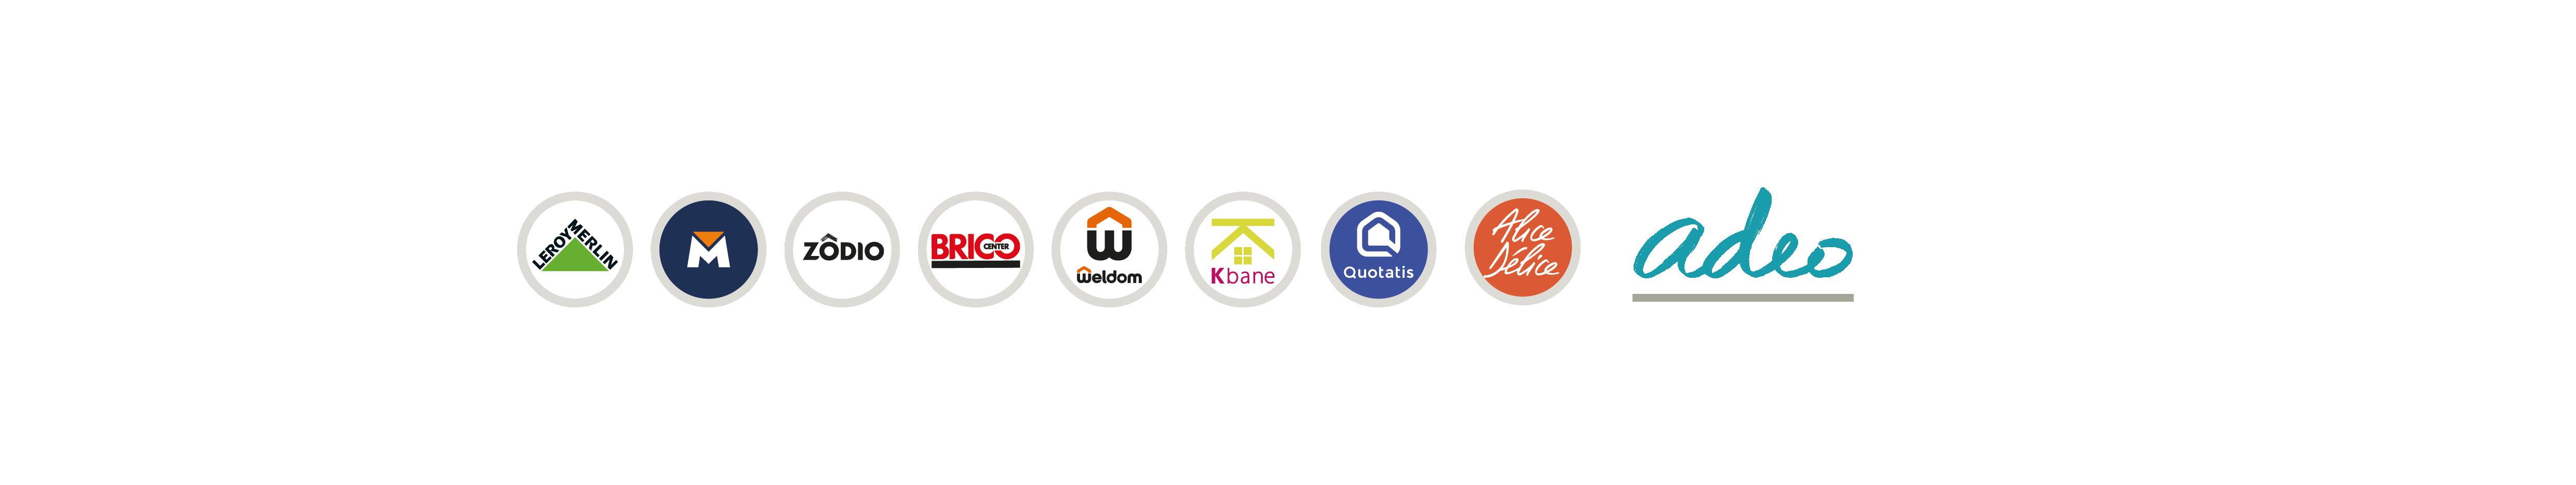 adeo logos